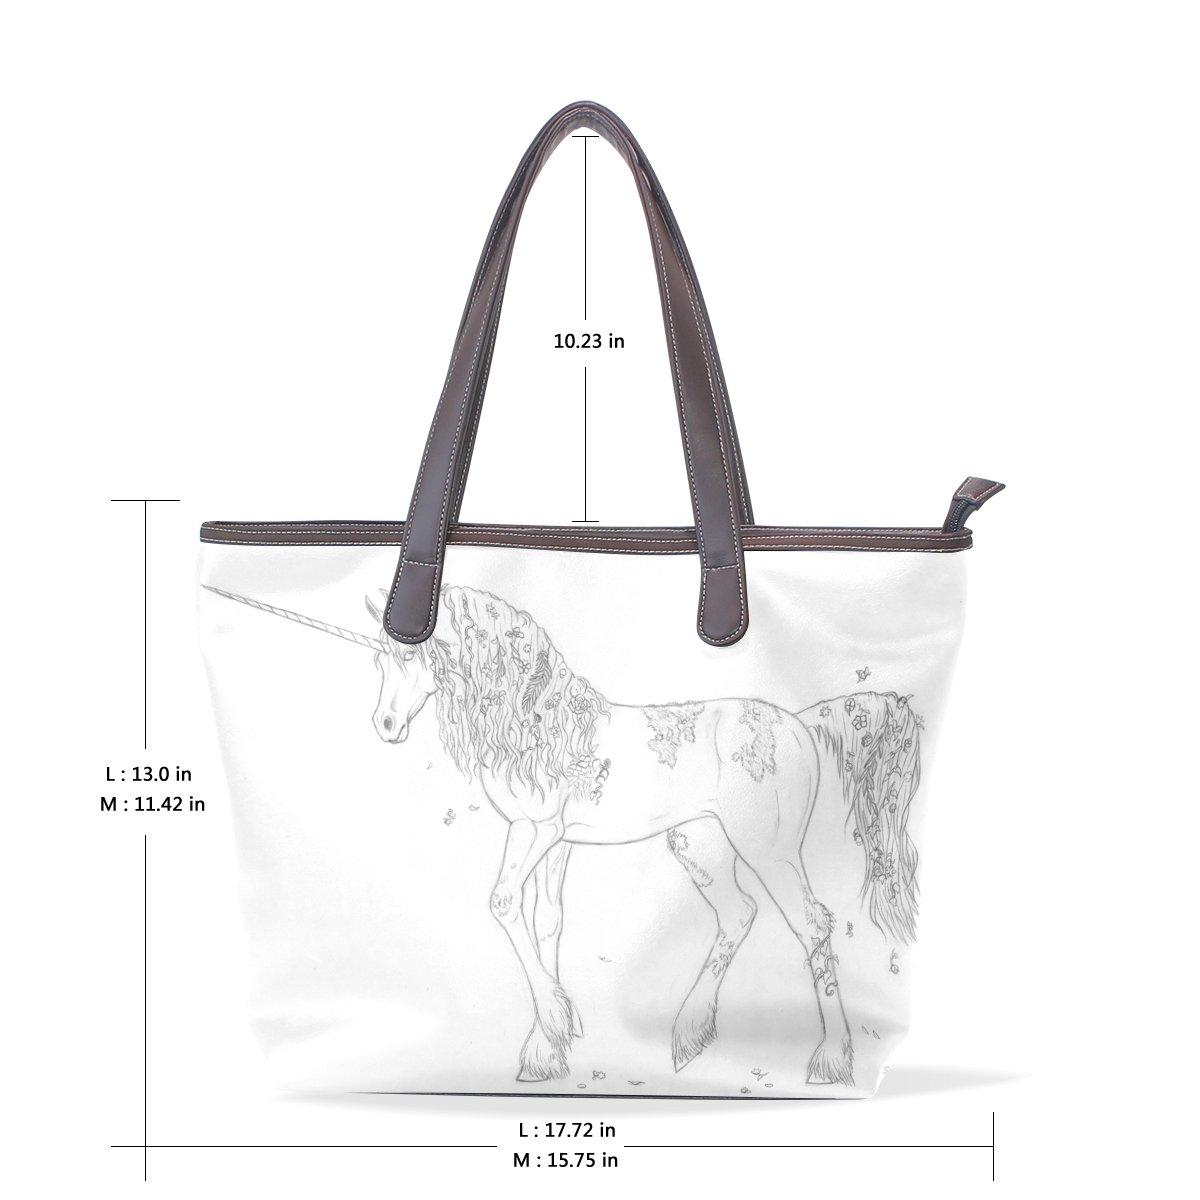 Ye Store White Horse Lady PU Leather Handbag Tote Bag Shoulder Bag Shopping Bag